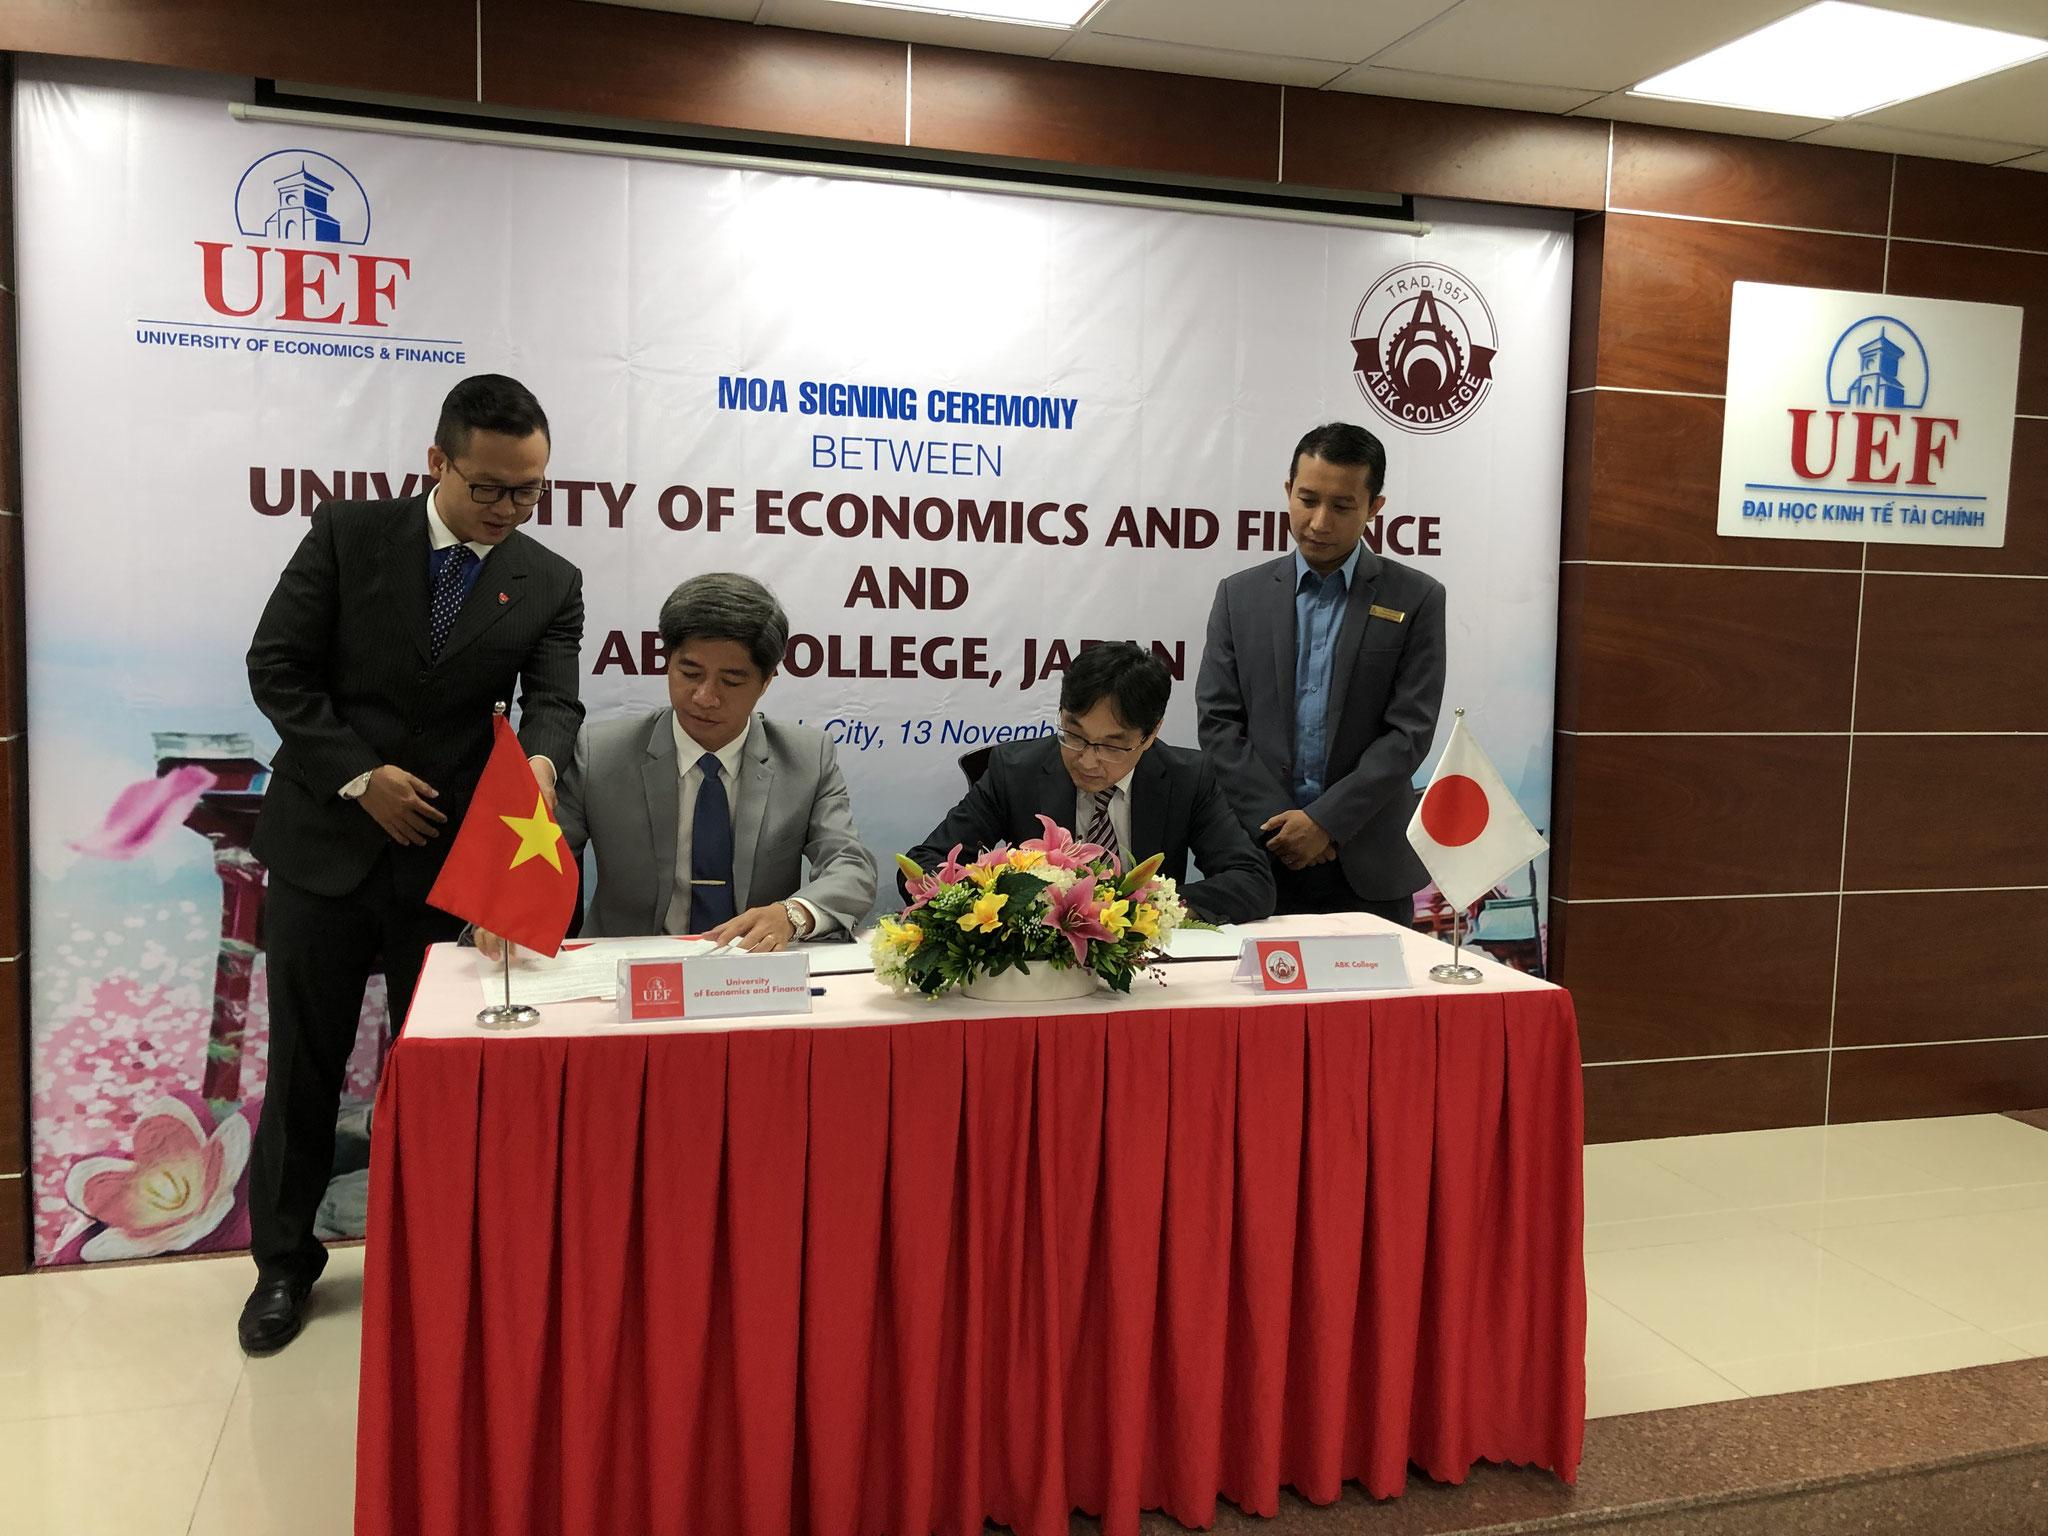 HO CHI MINH UNIVERSITY OF ECONOMICS & TECHNOLOGY's President NGUYEN THANH GIANG PhD.